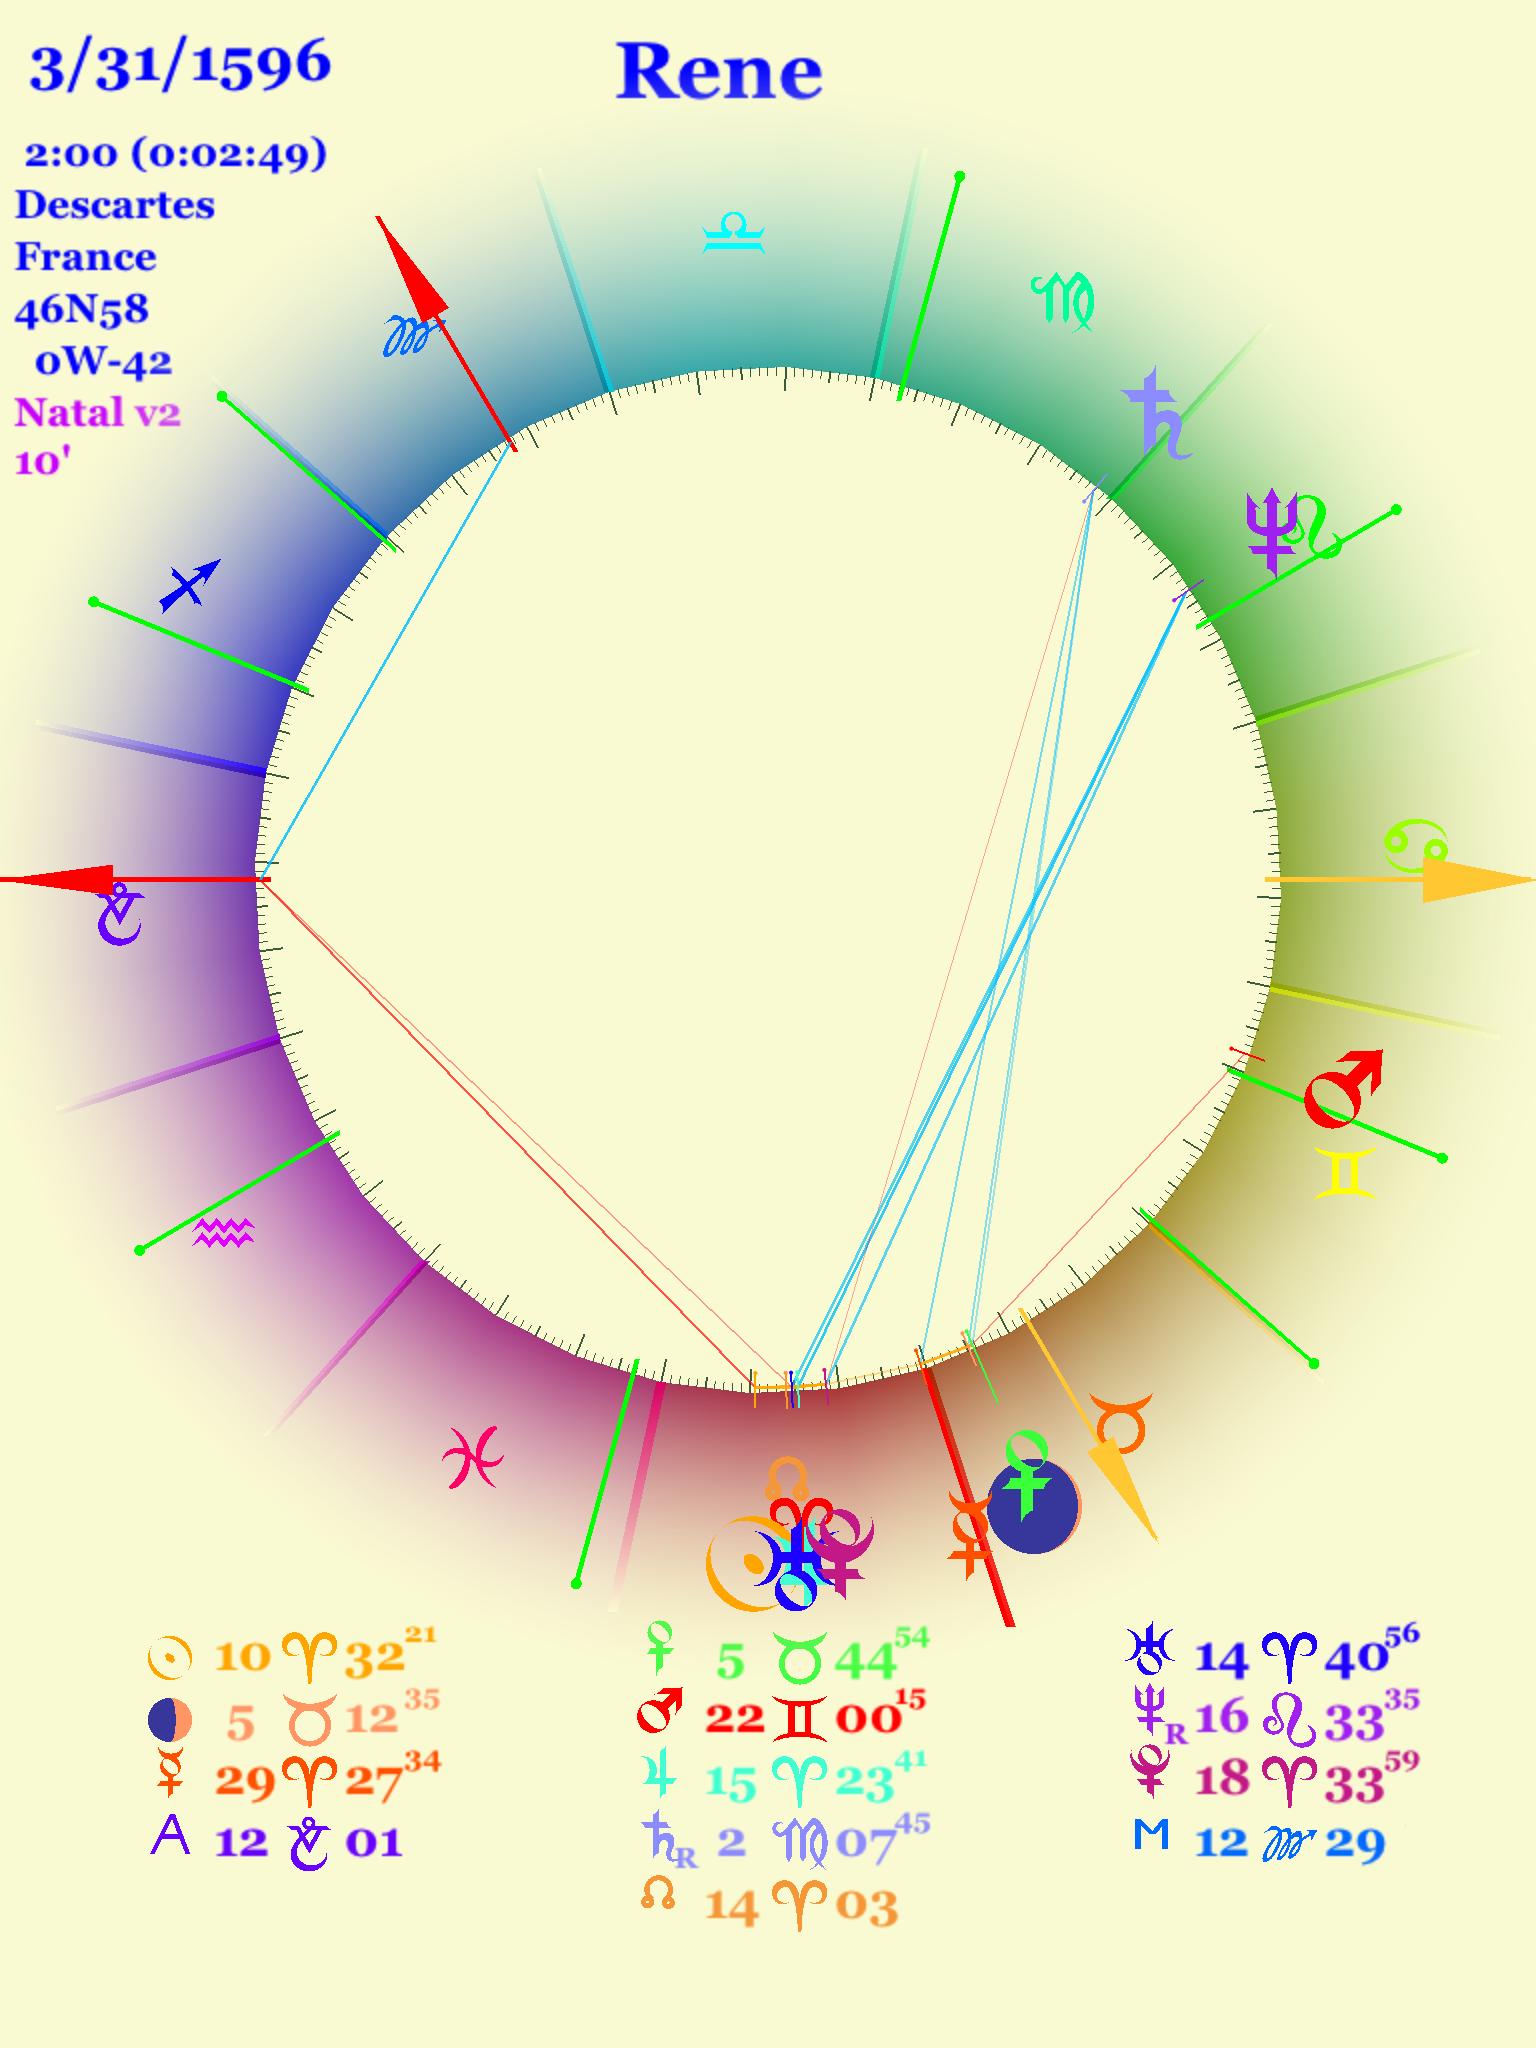 Birth chart for Rene Descartes